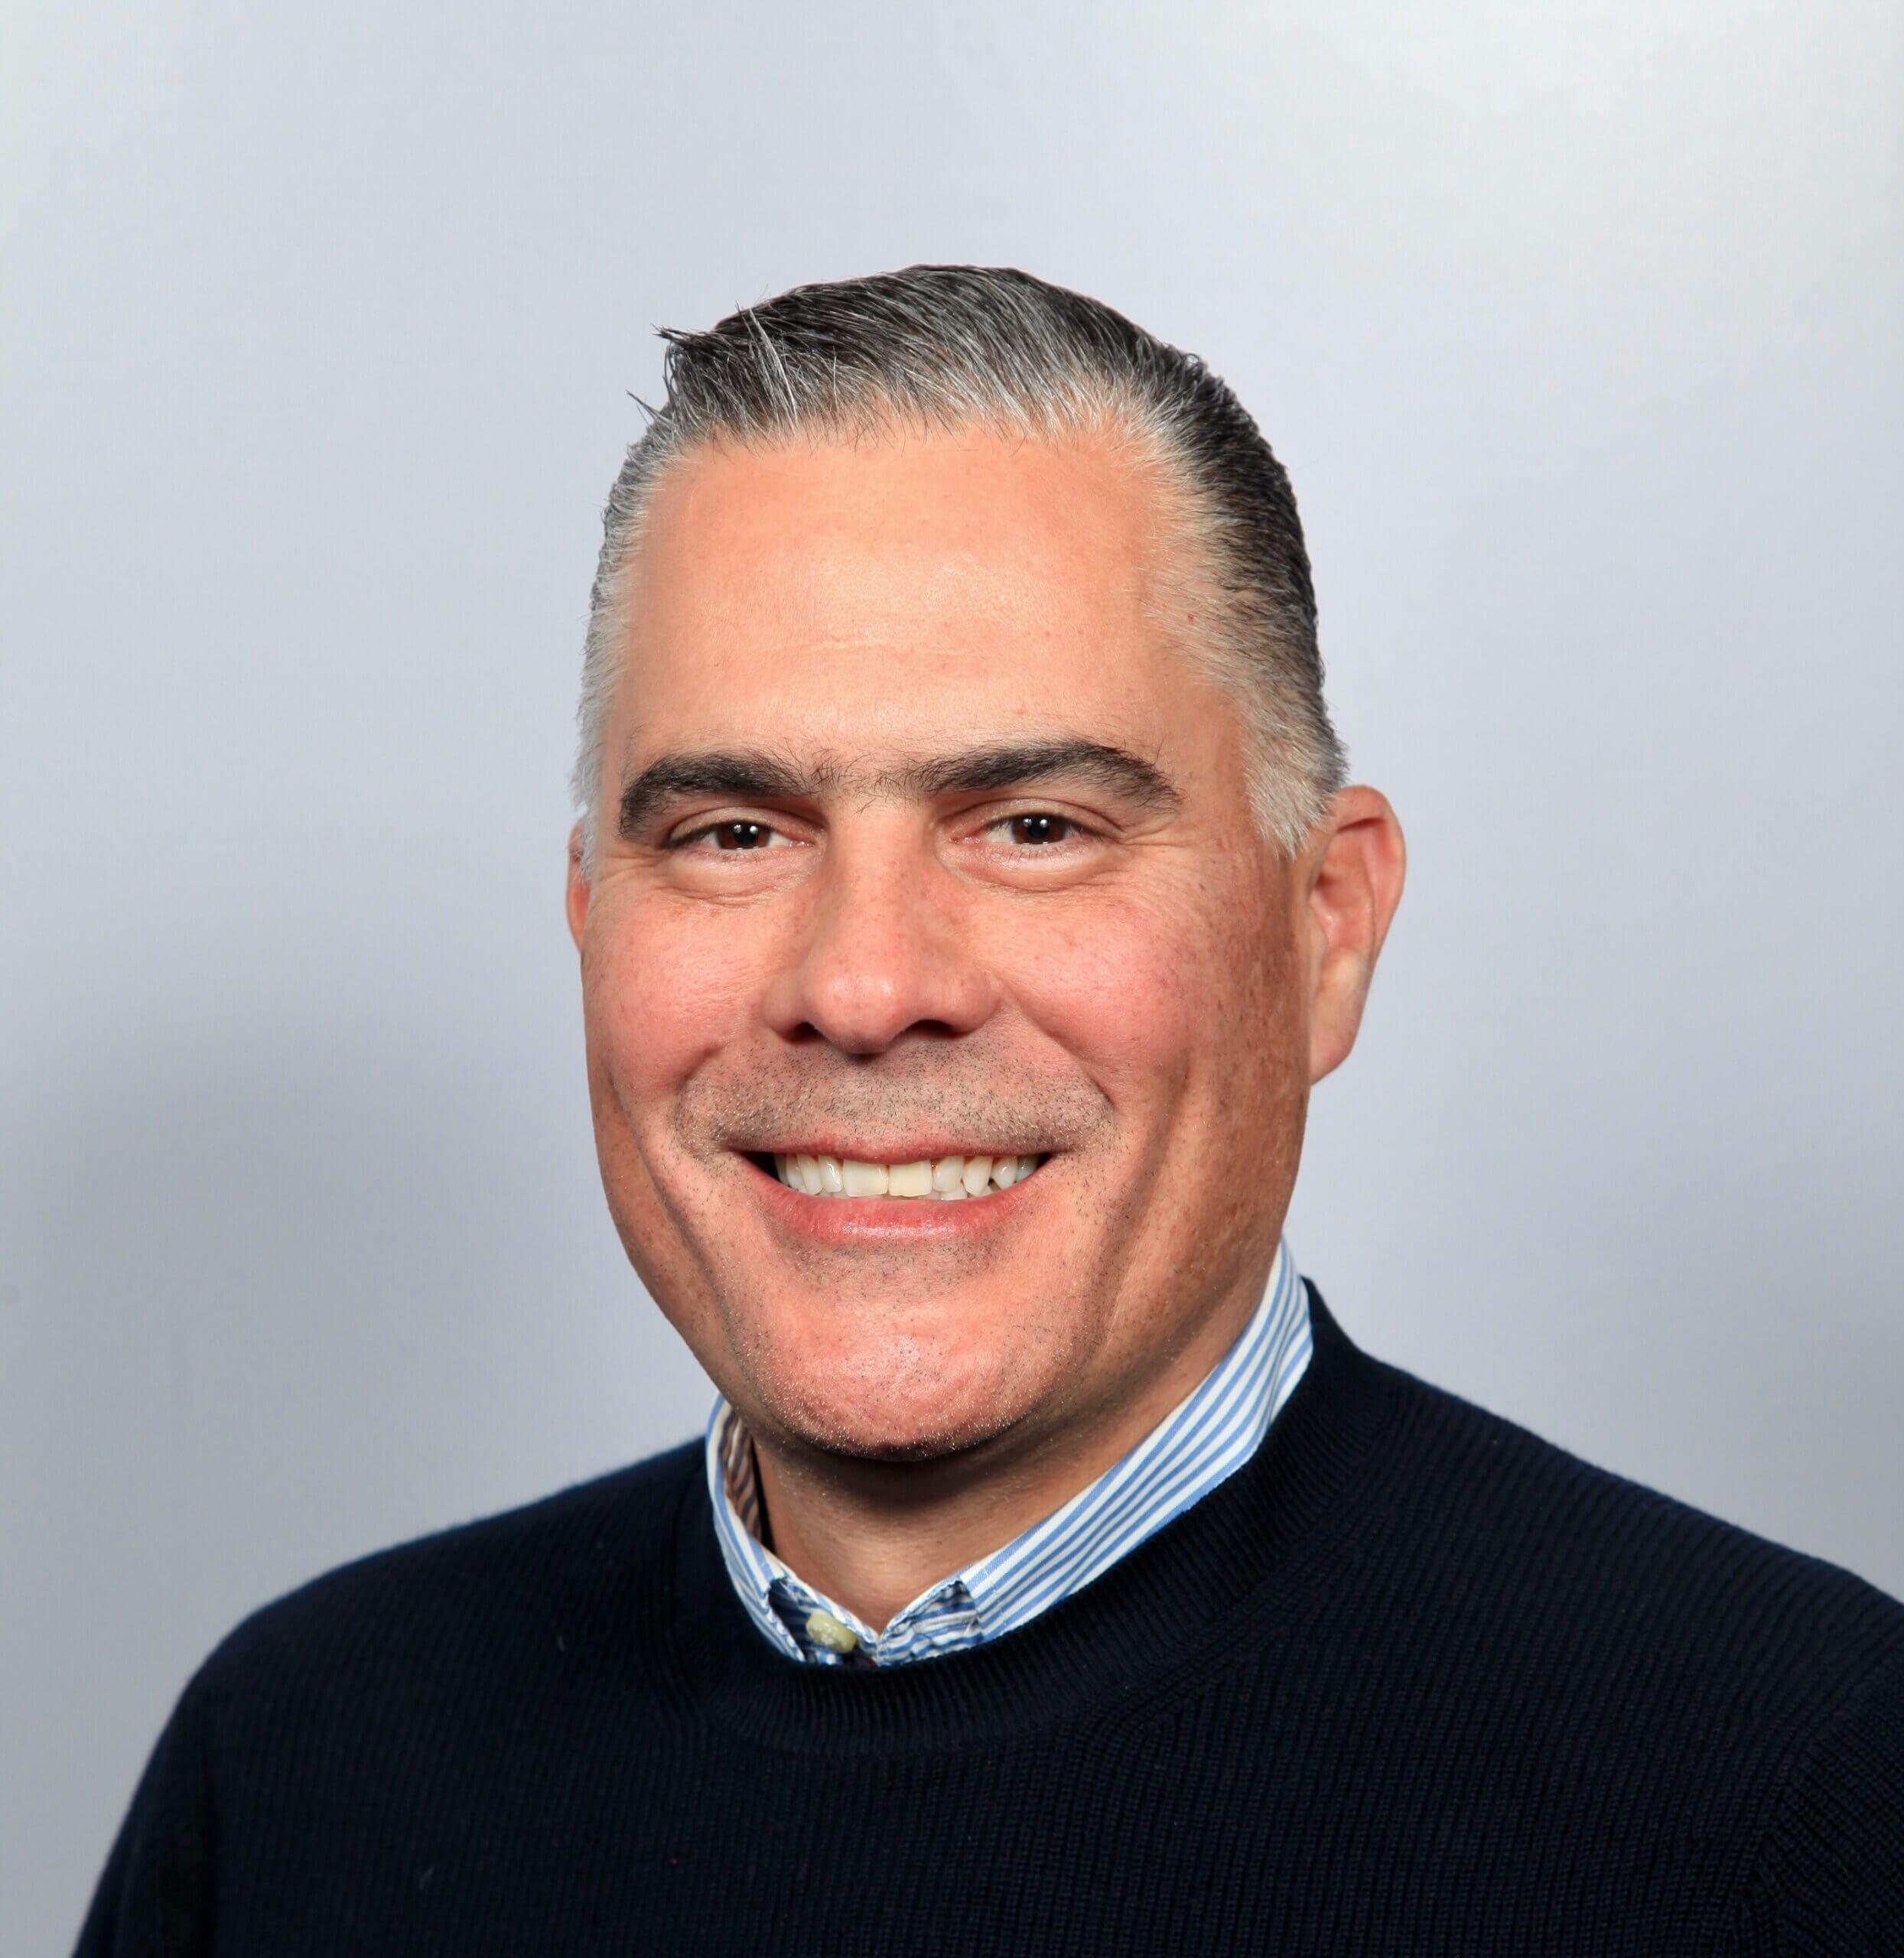 Picture of <br><br><br>Mauricio Gonzalez